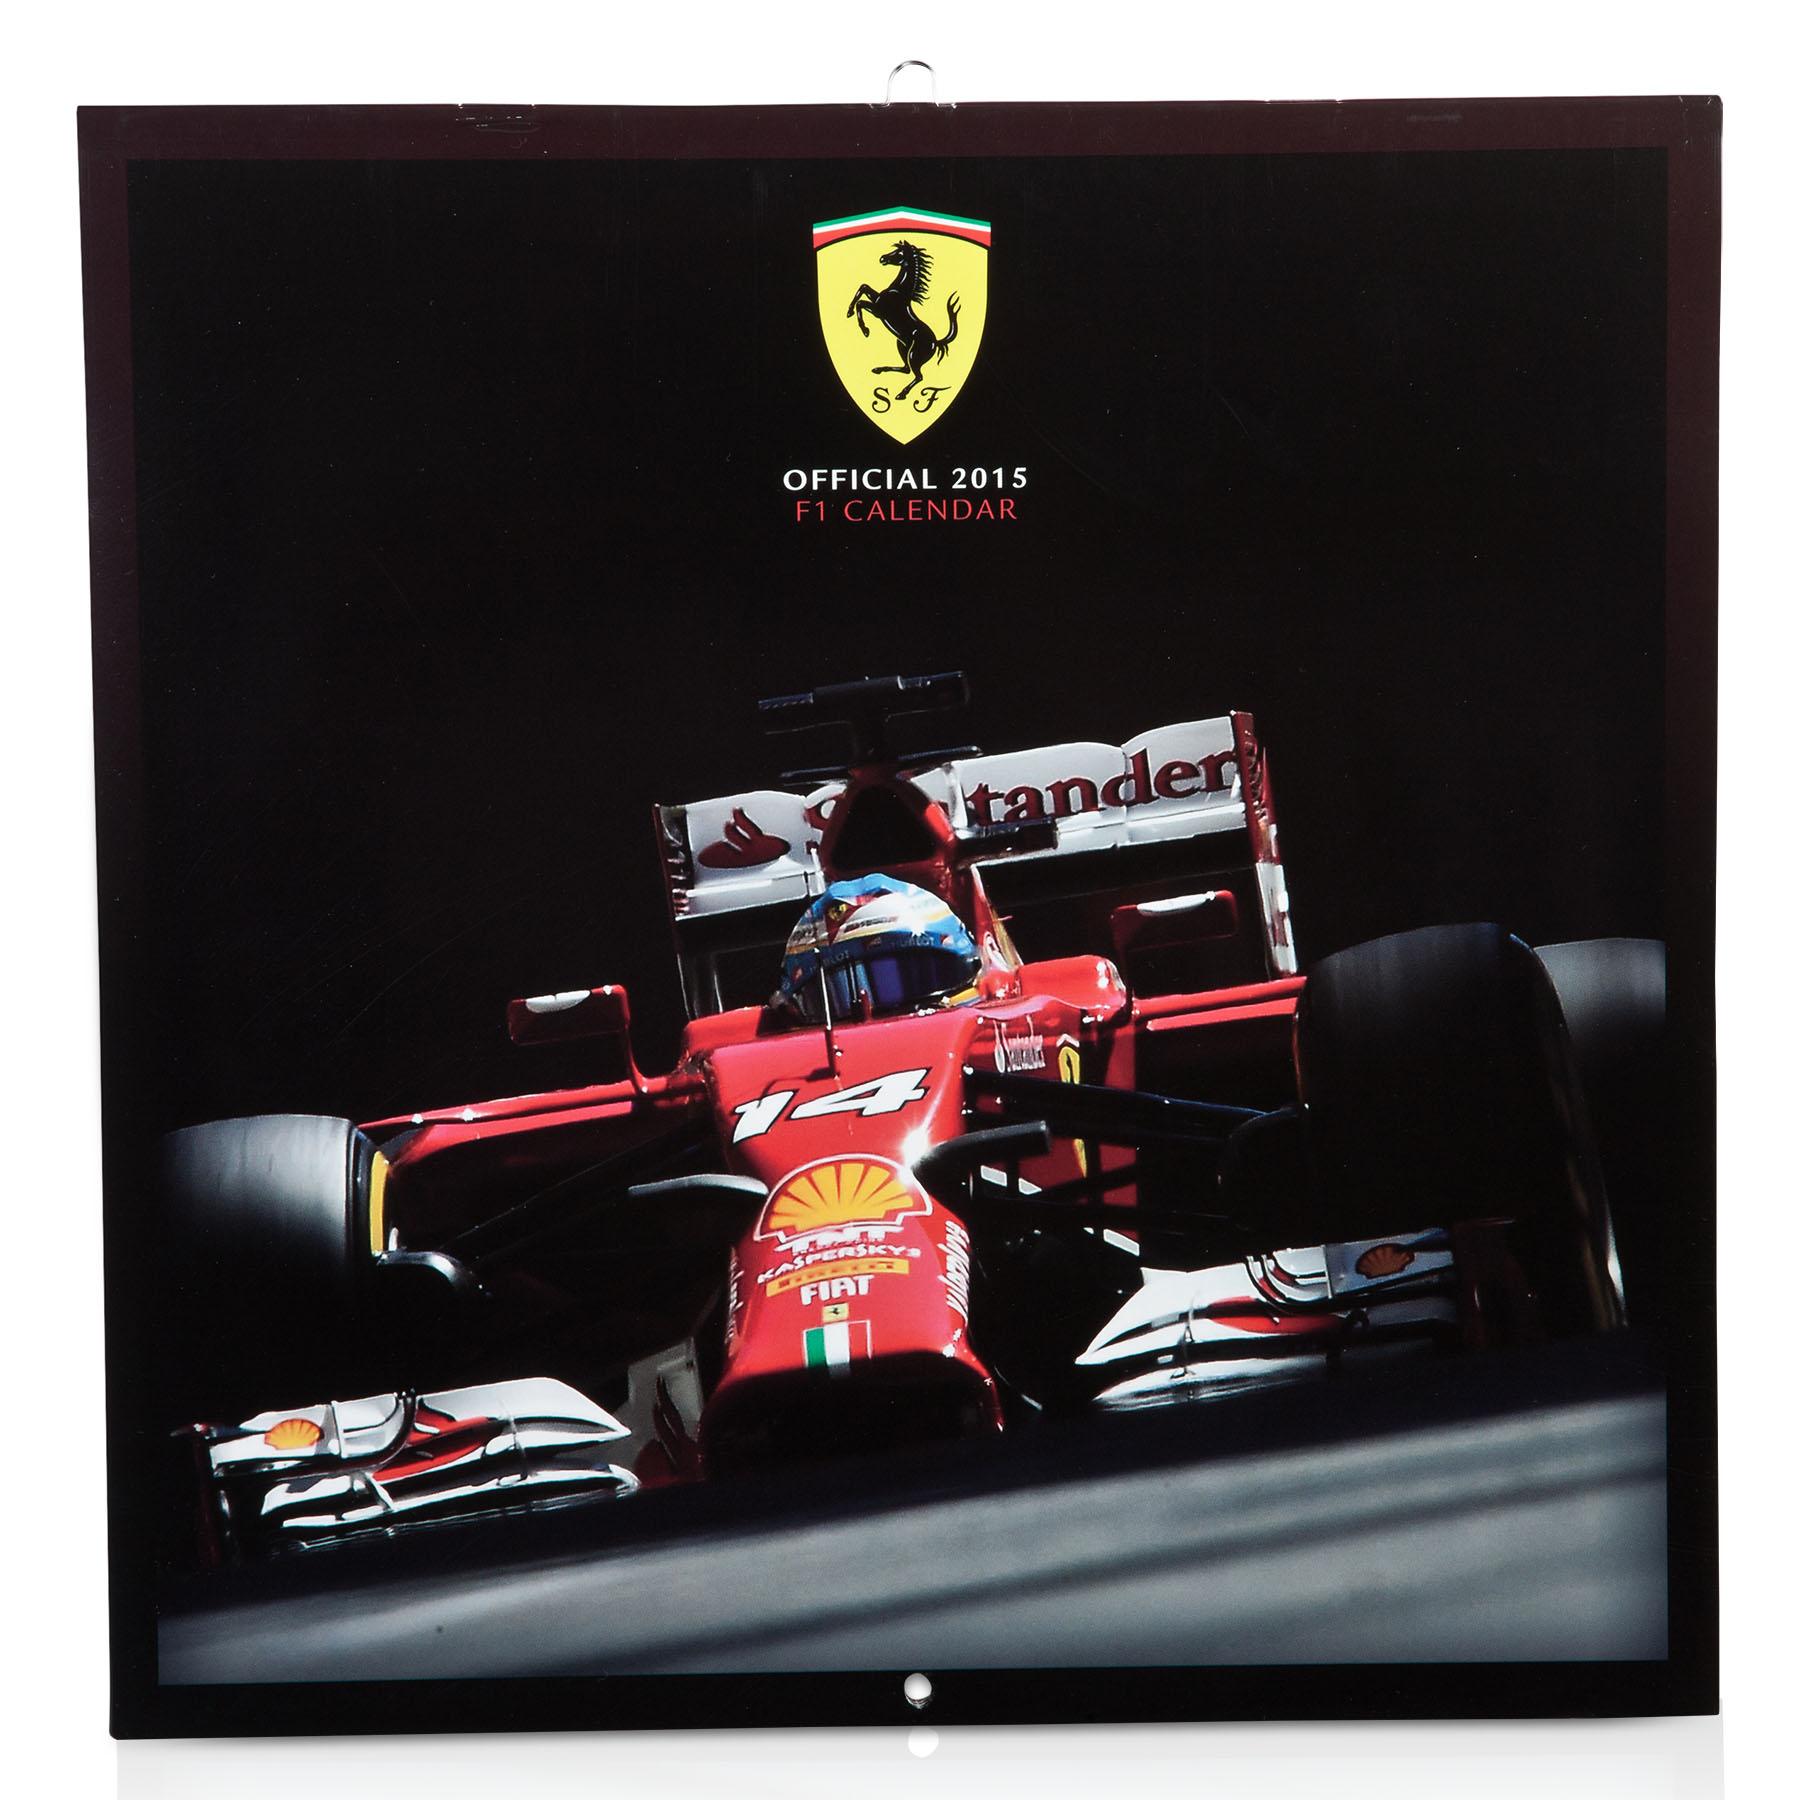 Scuderia Ferrari 2015 Official Calendar